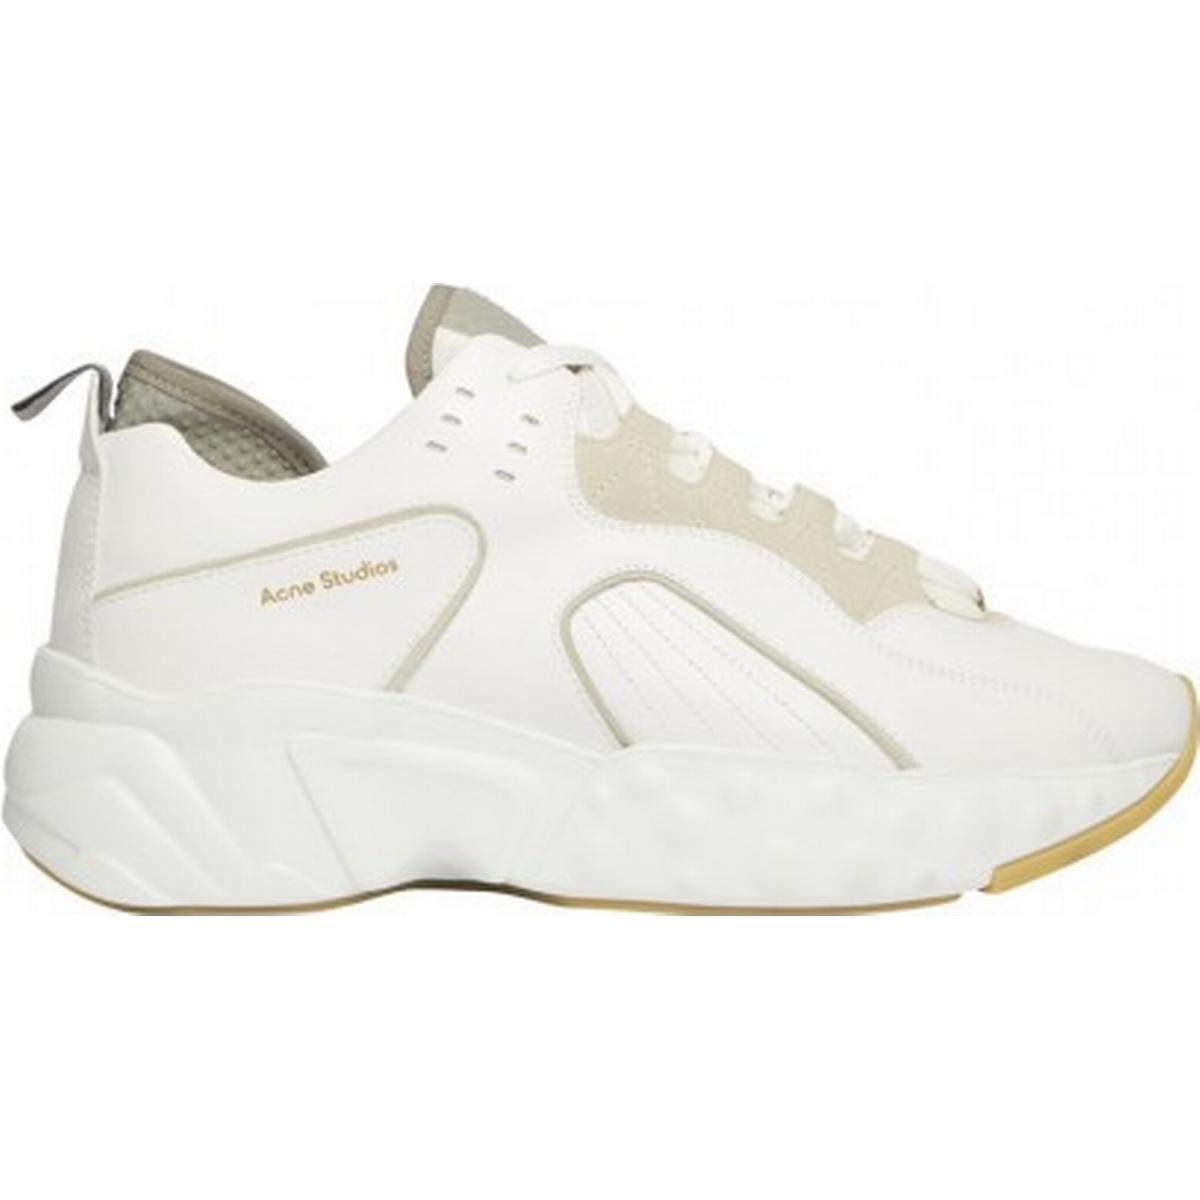 Acne Studios Sneakers (100+ produkter) hos PriceRunner • Se